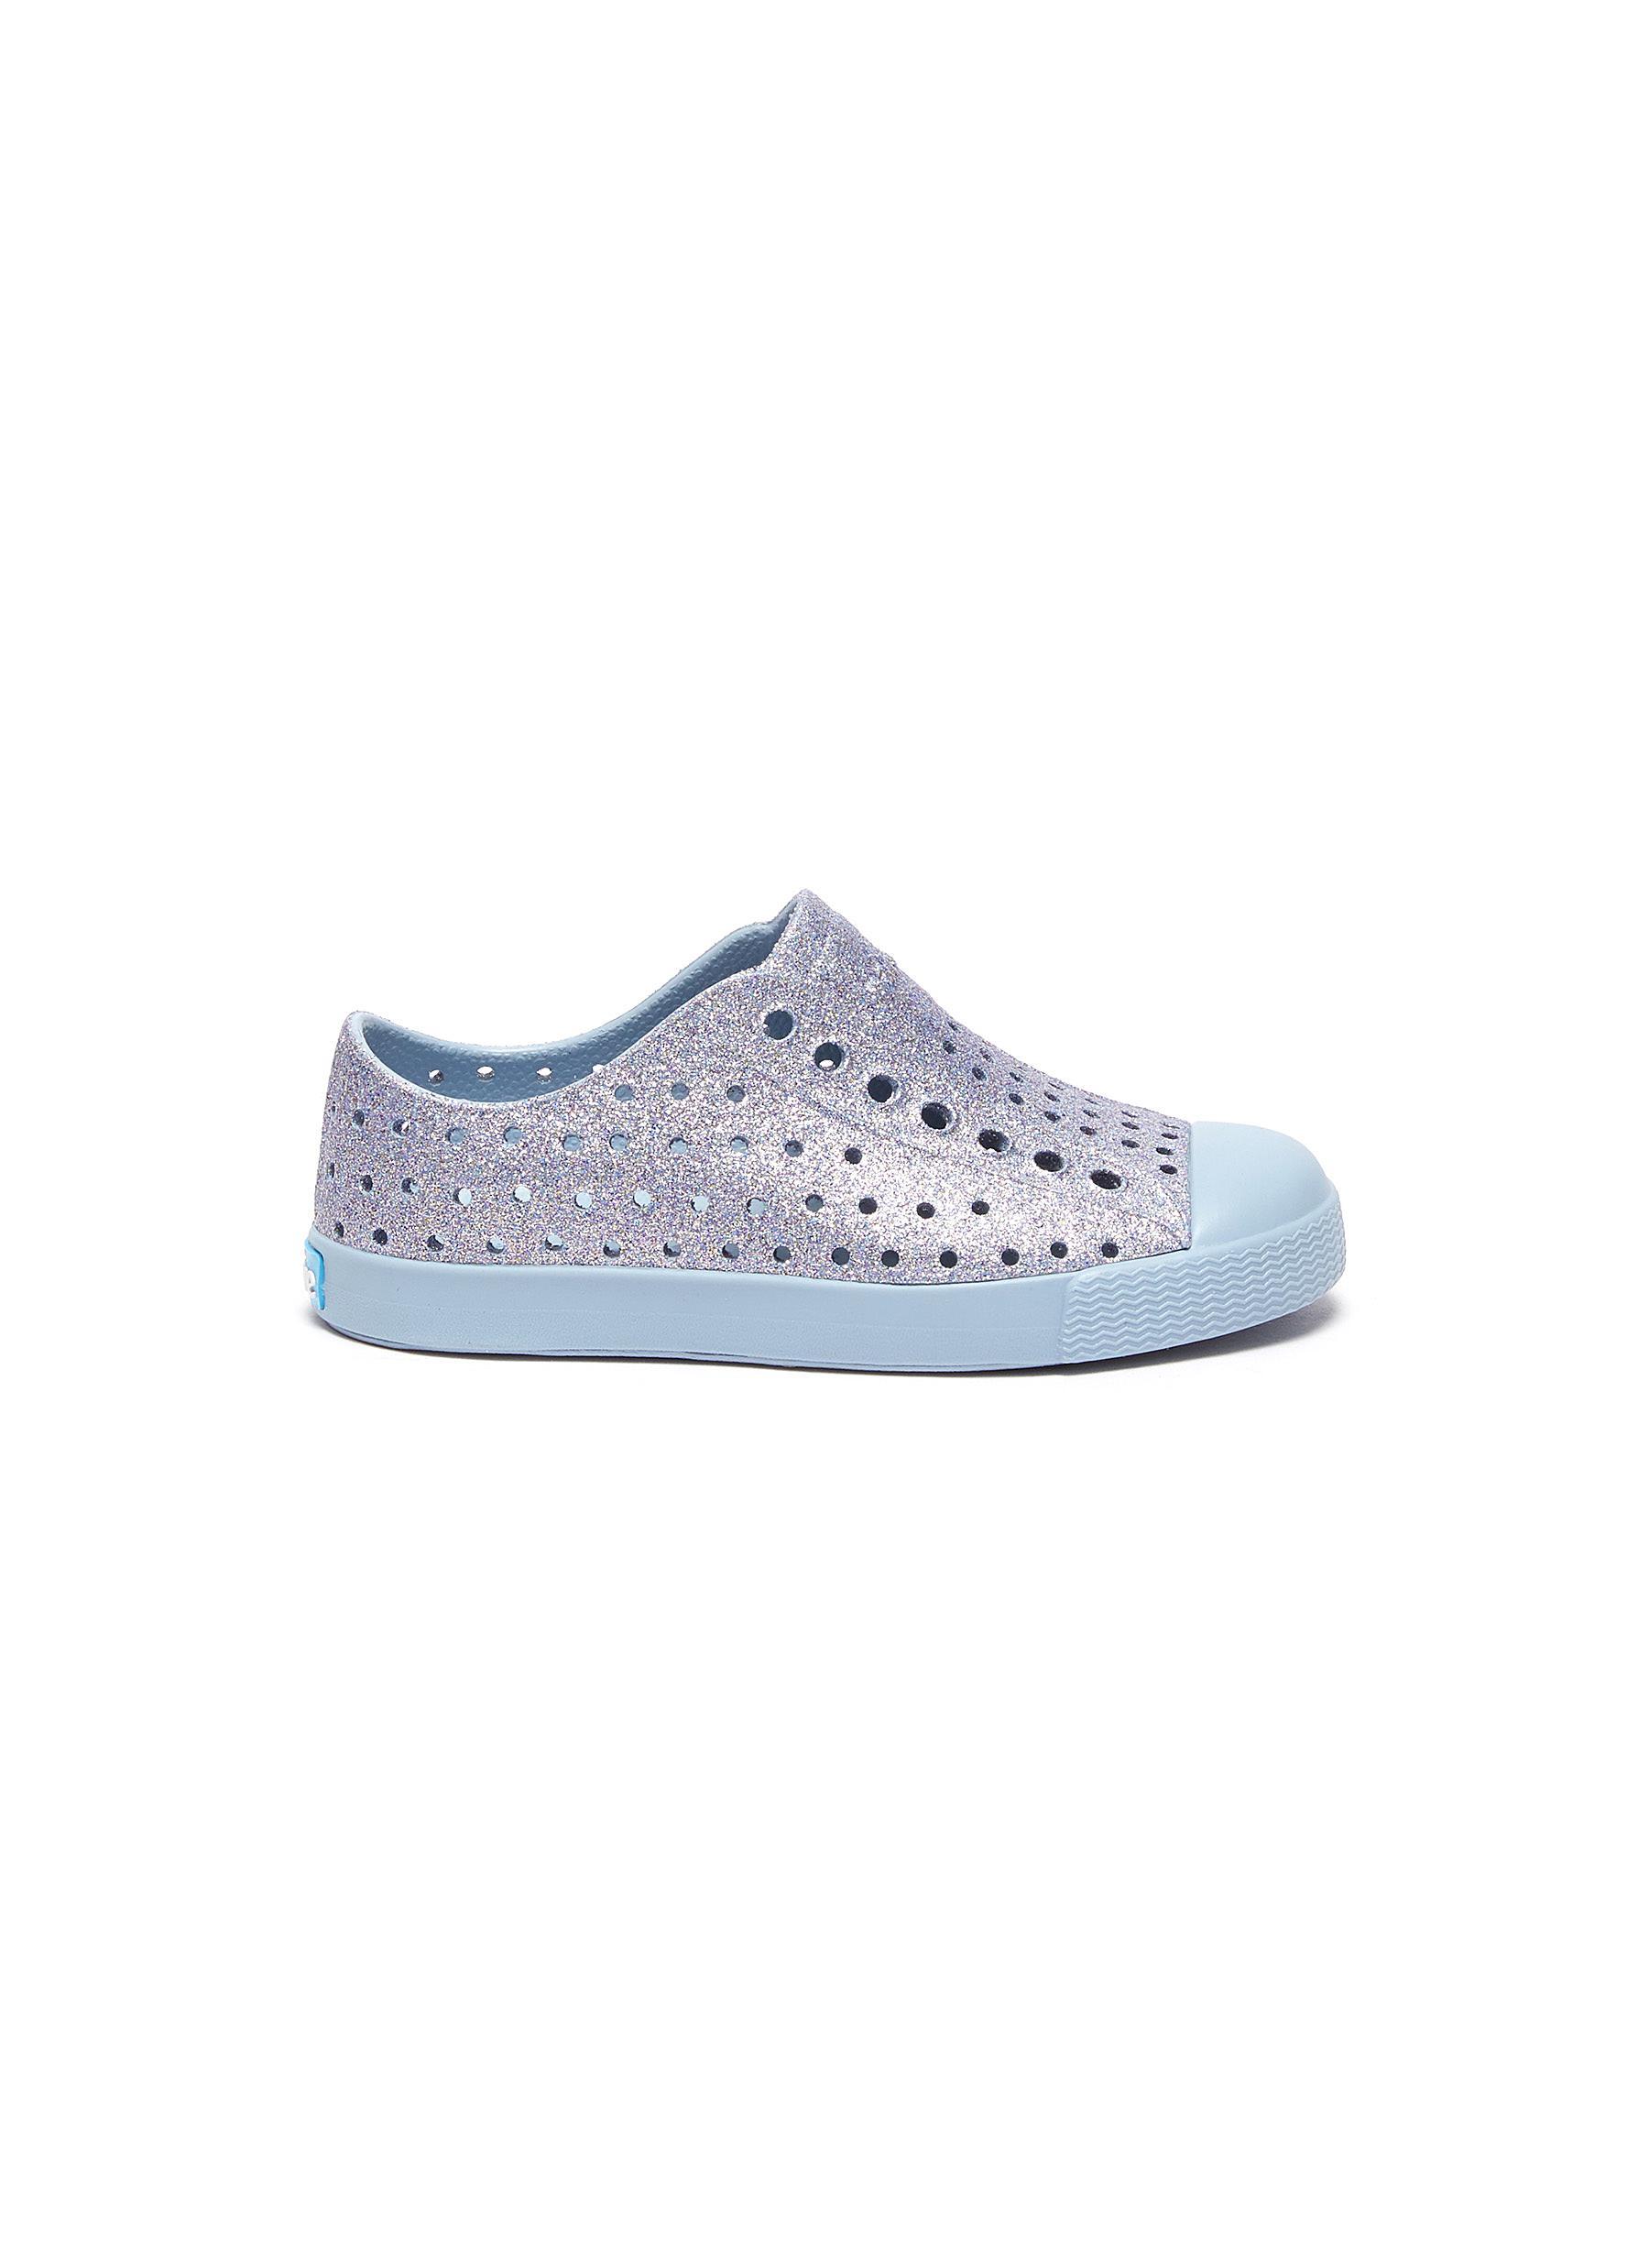 Jefferson' Perforated Shimmer Toddler Slip-on Sneakers - NATIVE - Modalova